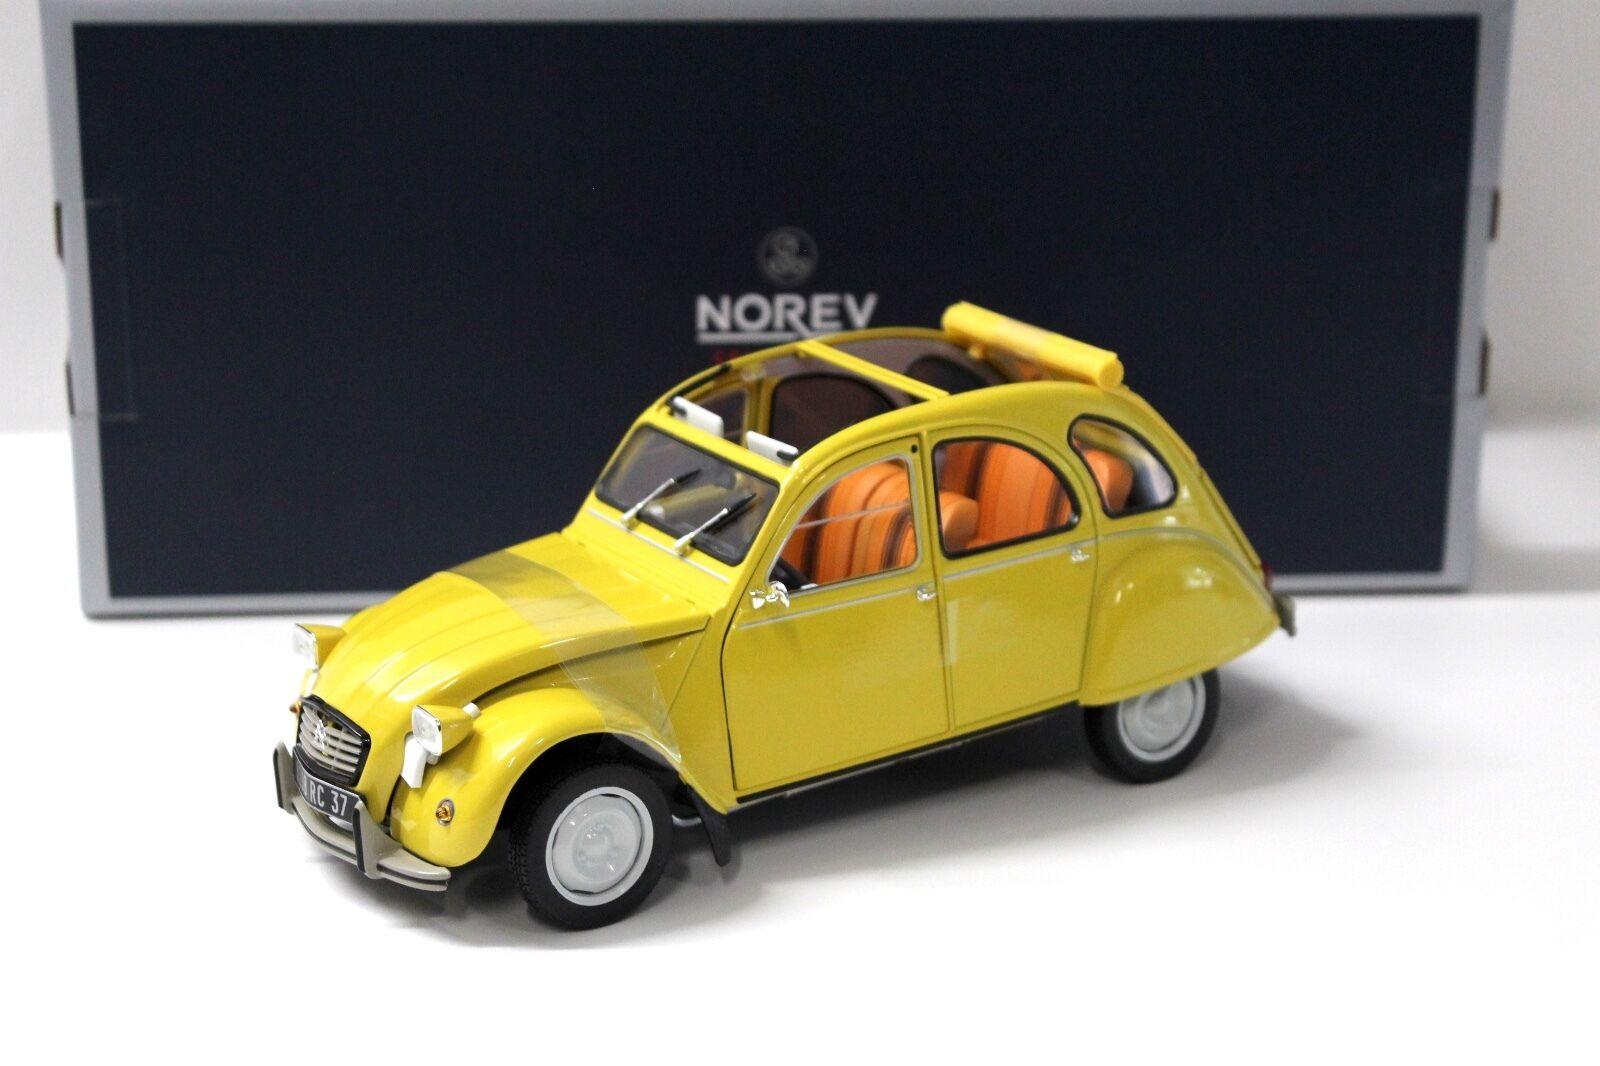 1 18 Norev Citroen 2cv 1979 Club Mimosa jaune New chez Premium-modelcars